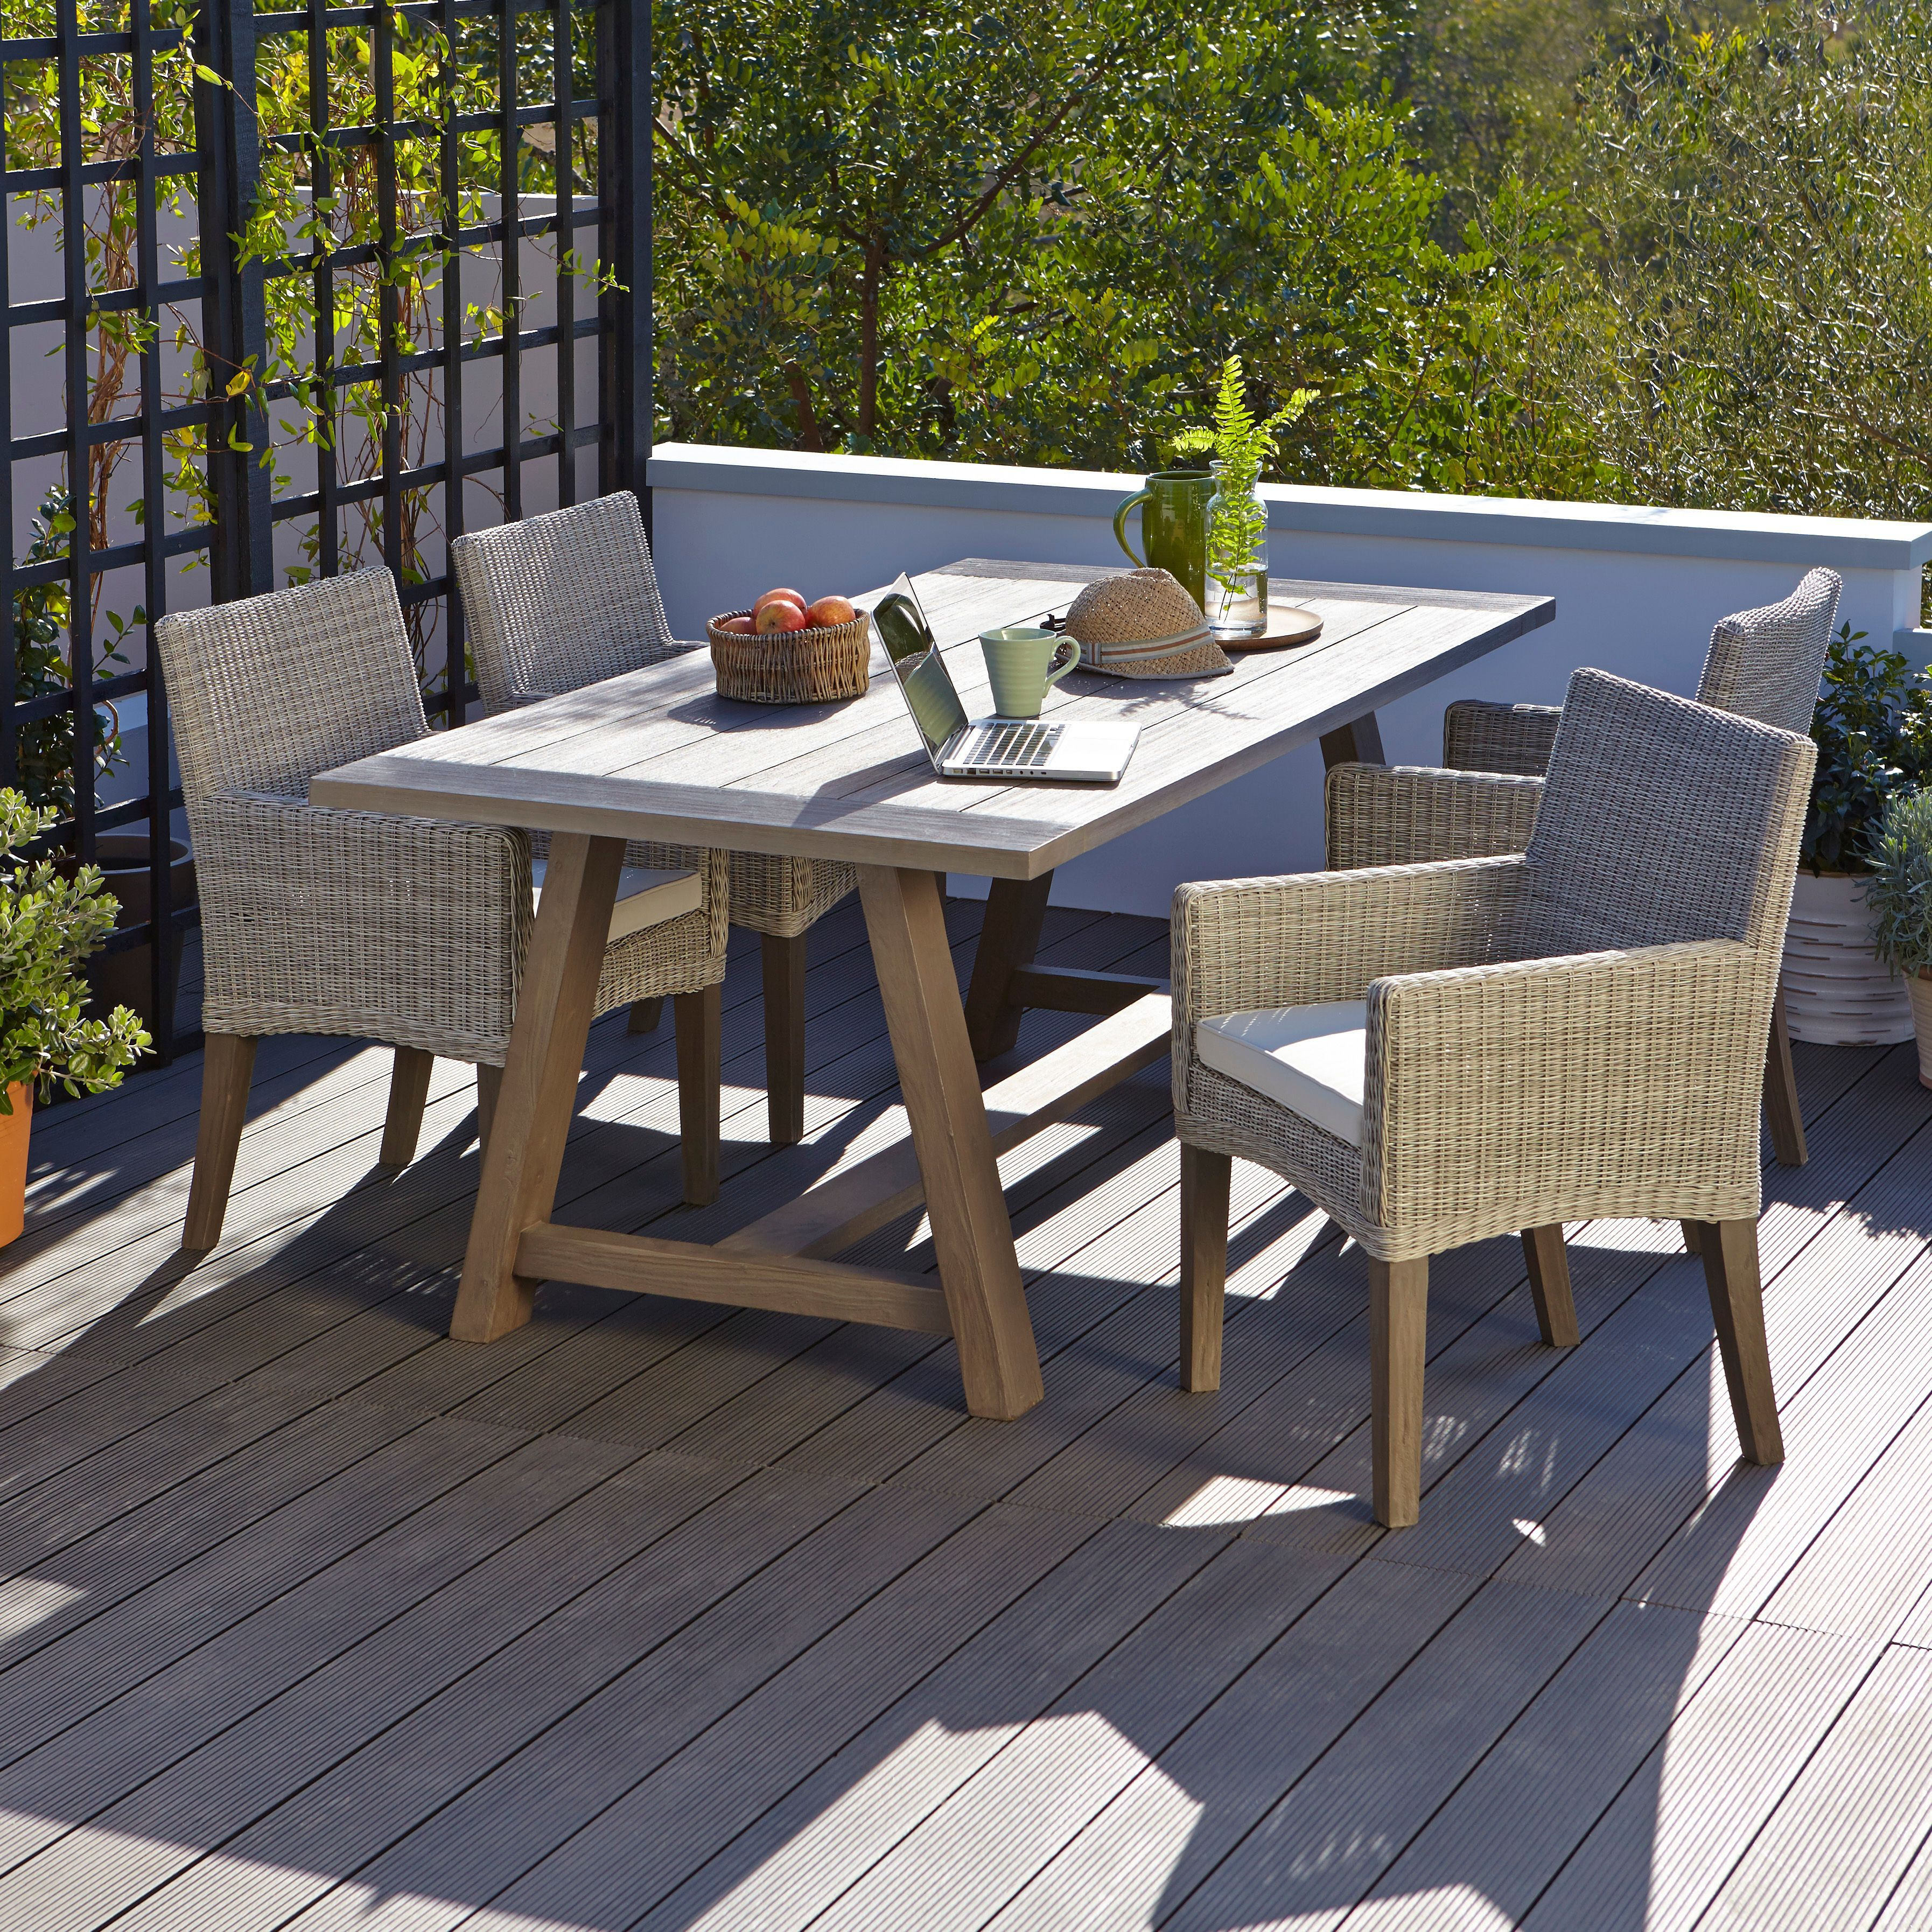 Praslin Seater Garden Dining Set   Departments   DIY at B&Q